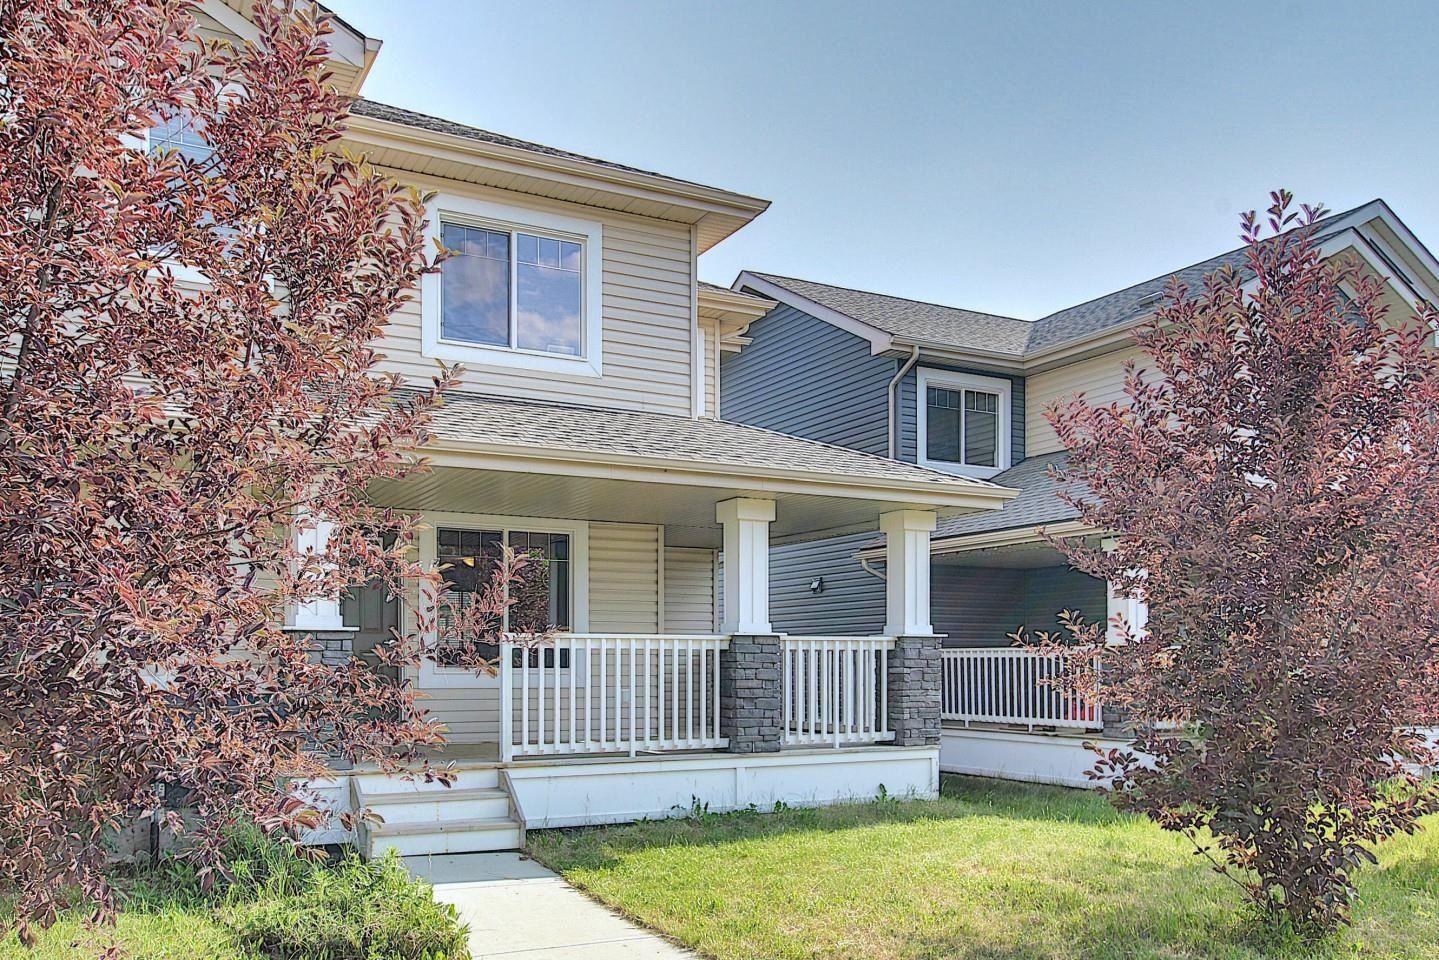 Main Photo: 17617 10 Avenue SW in Edmonton: Zone 56 Attached Home for sale : MLS®# E4262399